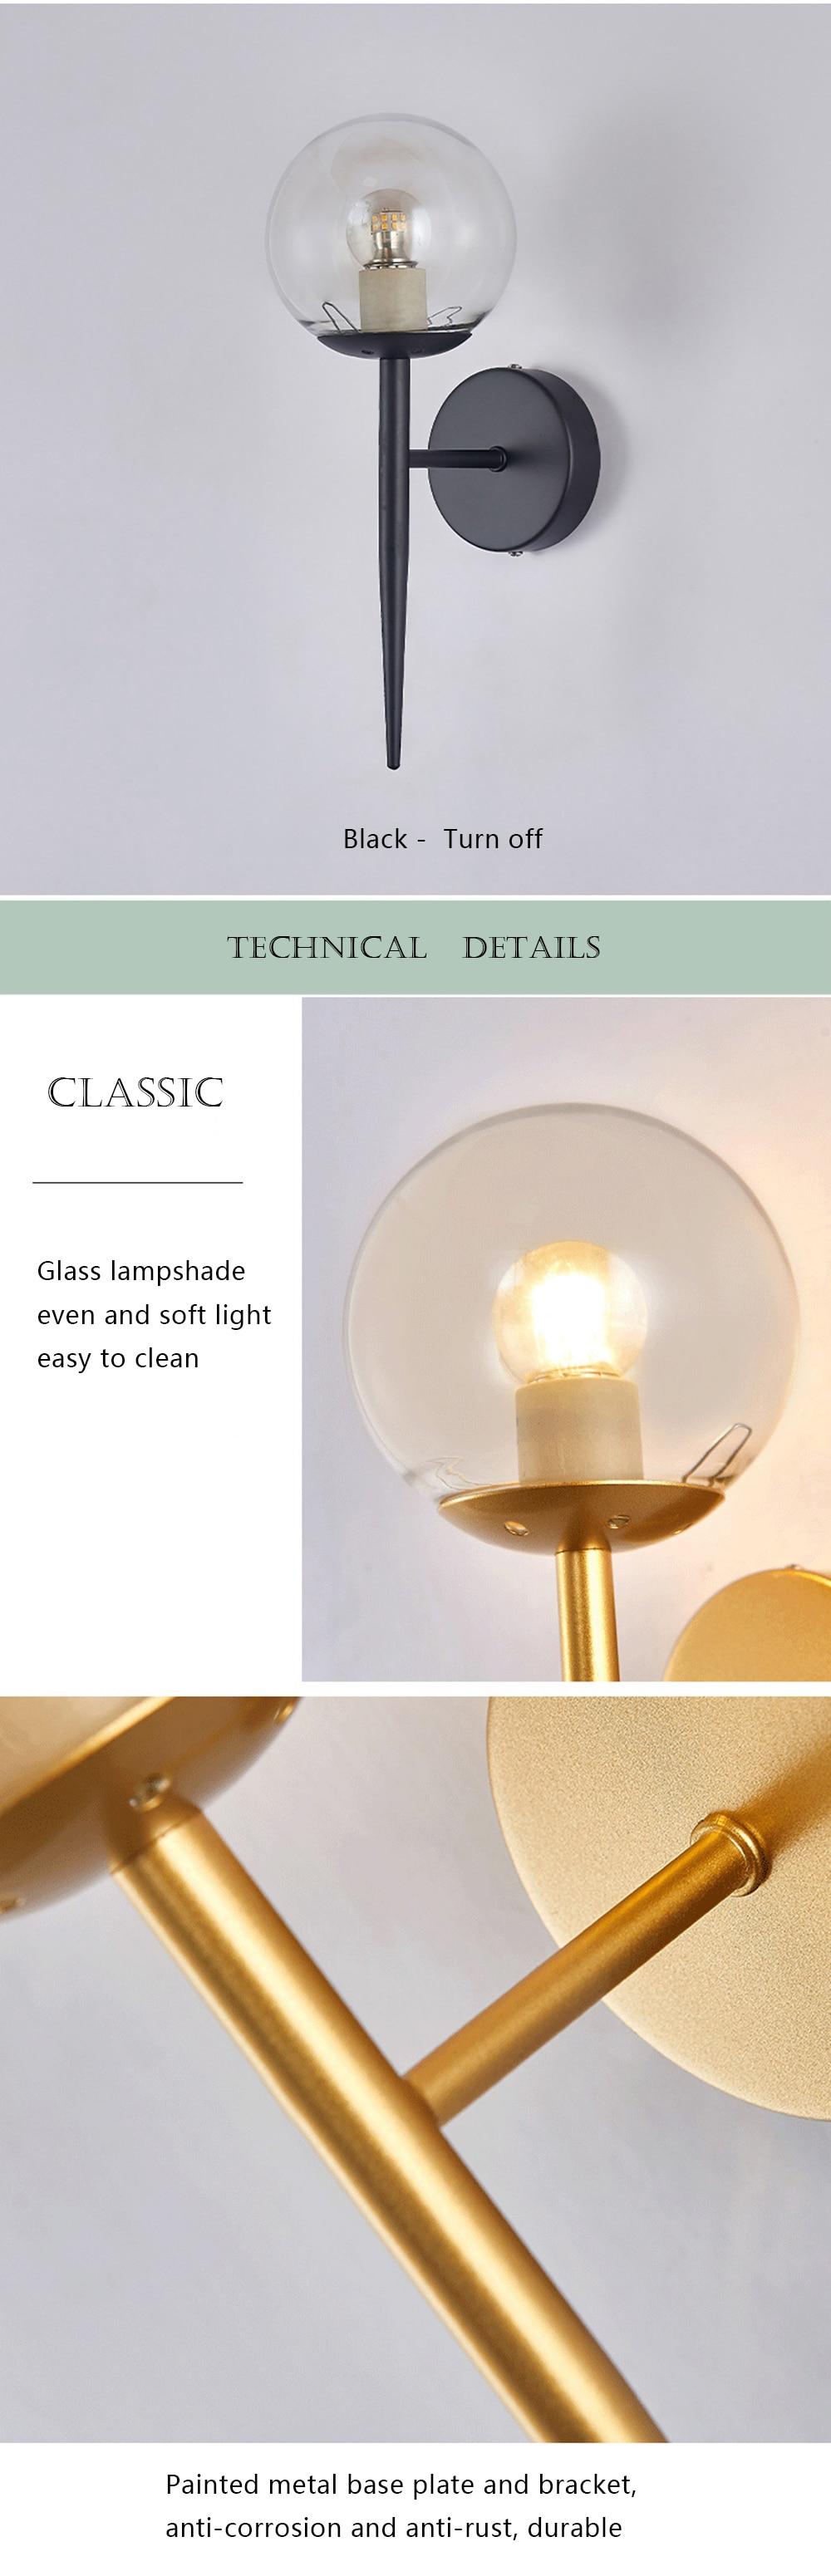 Decorative Bedside Wall Lamp Shade Free Shipping